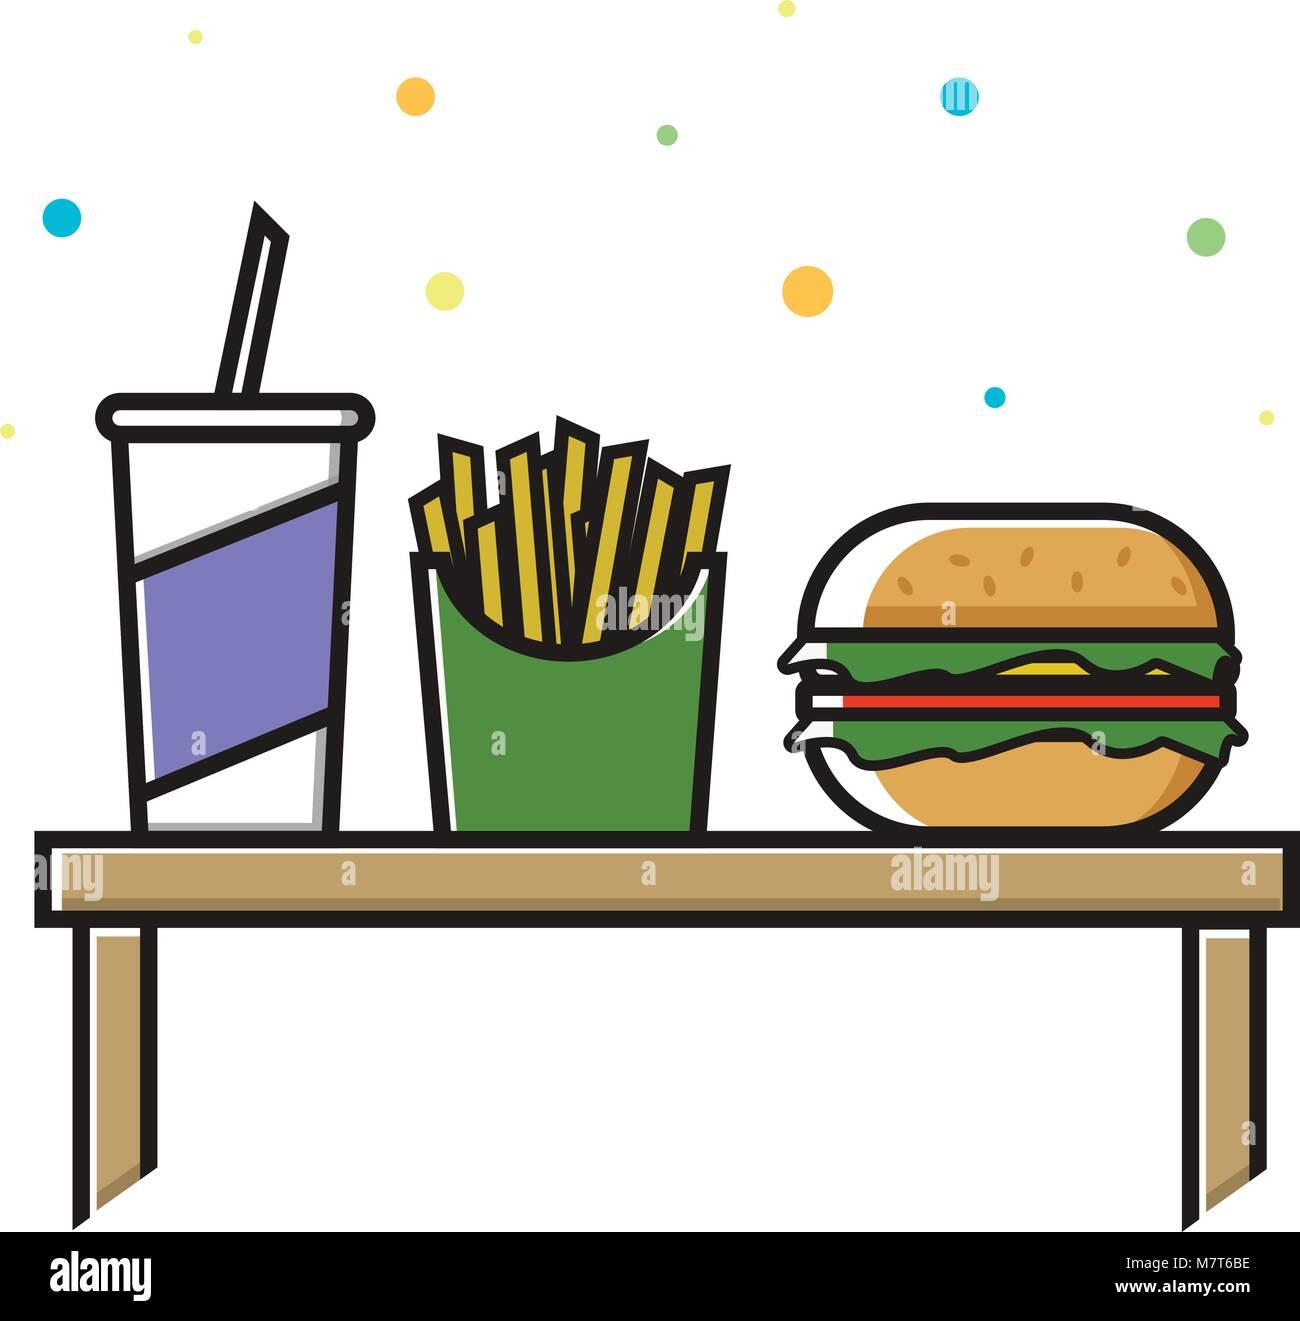 Hamburger French Fries Food Restaurant Stock Photos & Hamburger ...